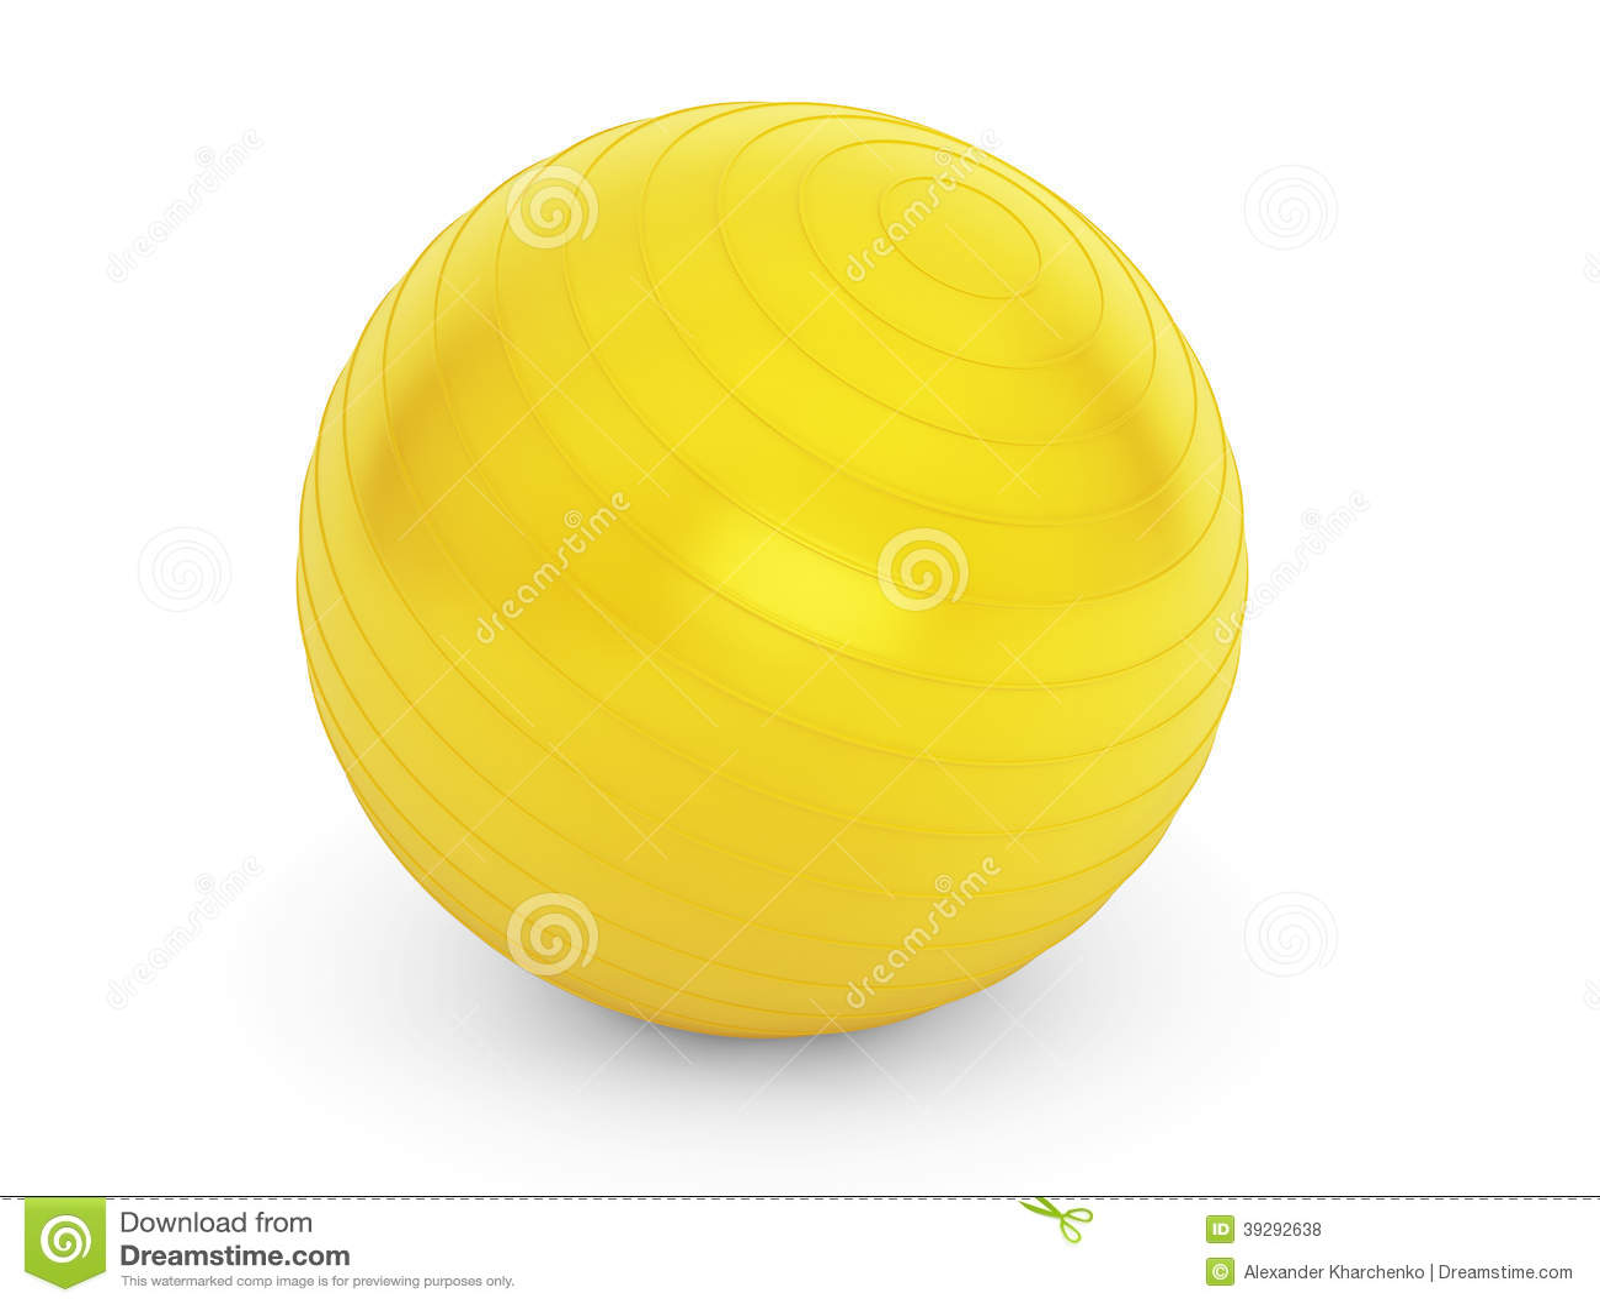 big ball - photo #46